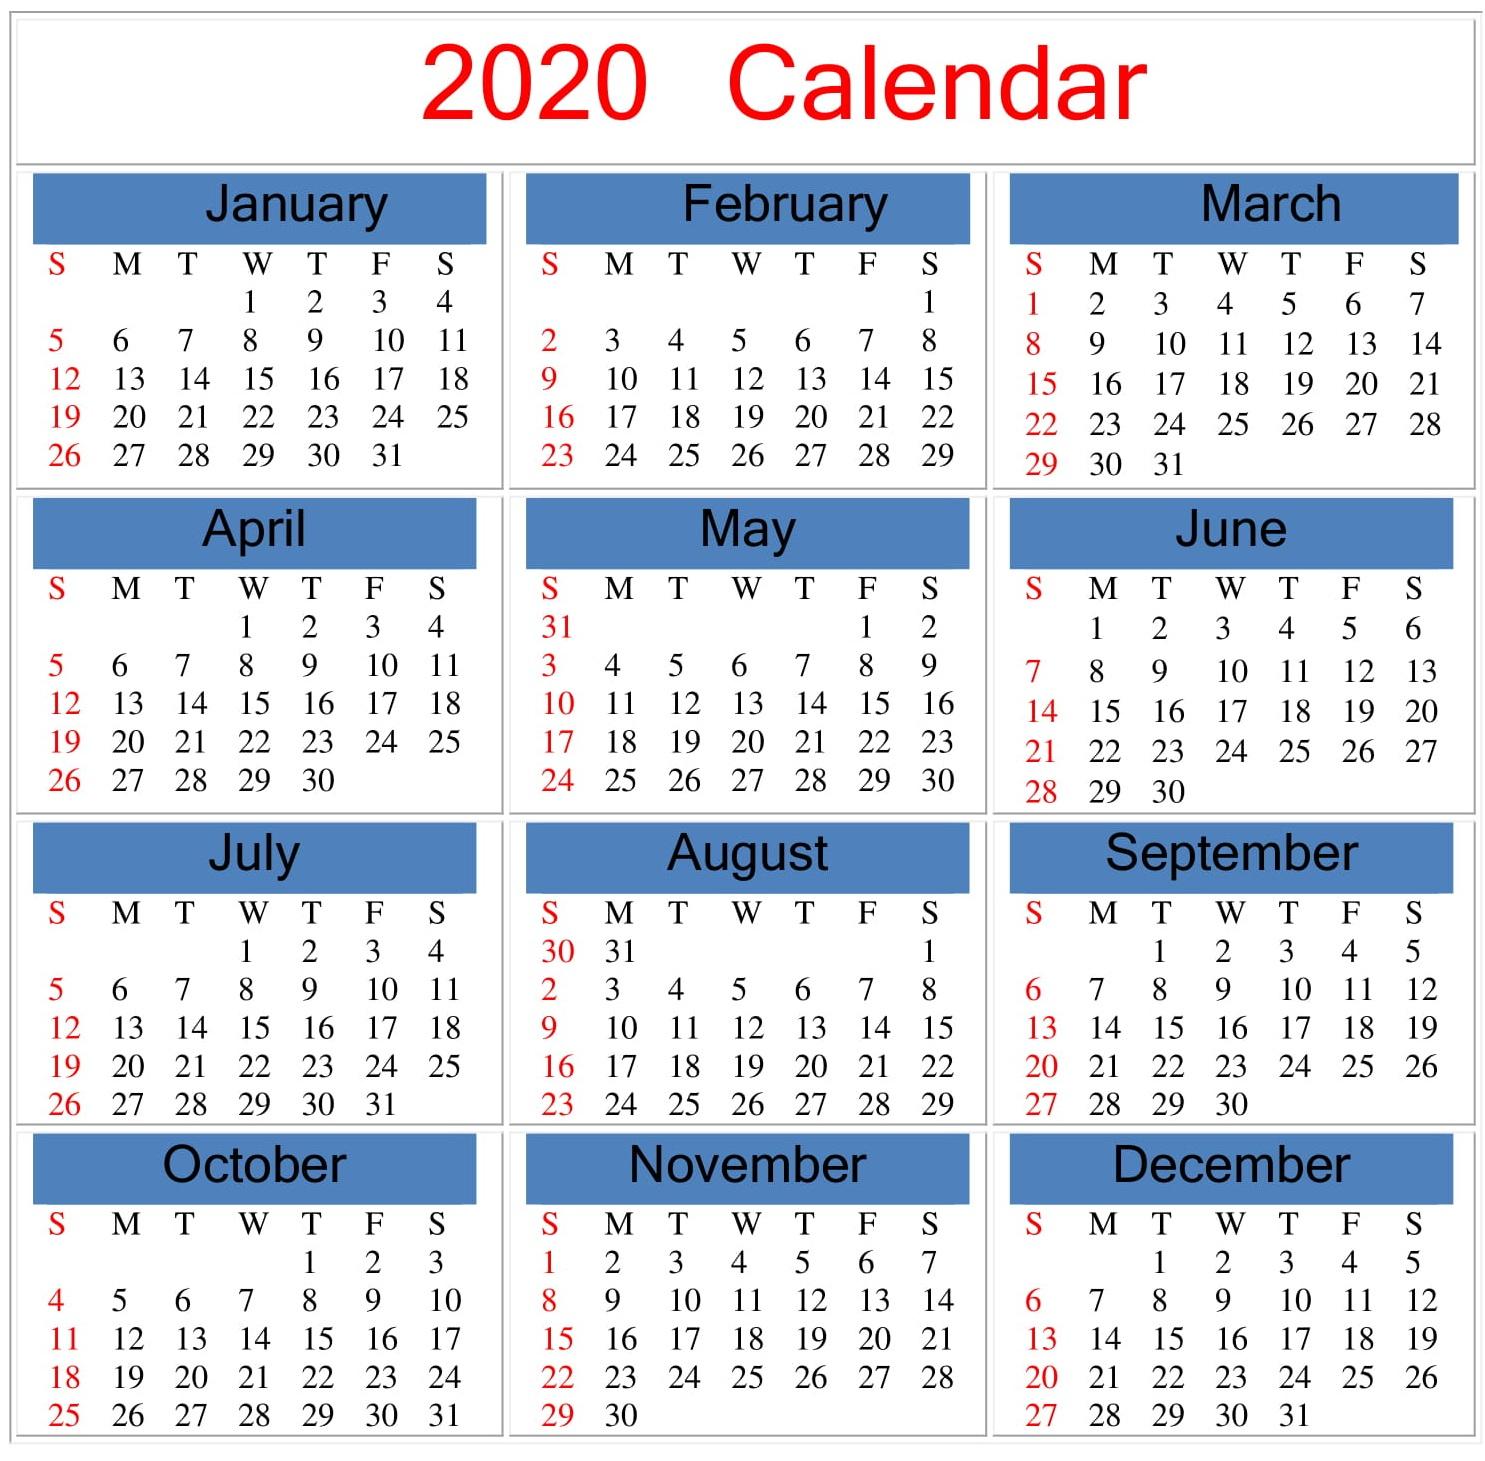 Free Printable 2020 Calendar Word, Pdf, Excel Document Intended For Gregorian & Am & Julian Calendar 2022